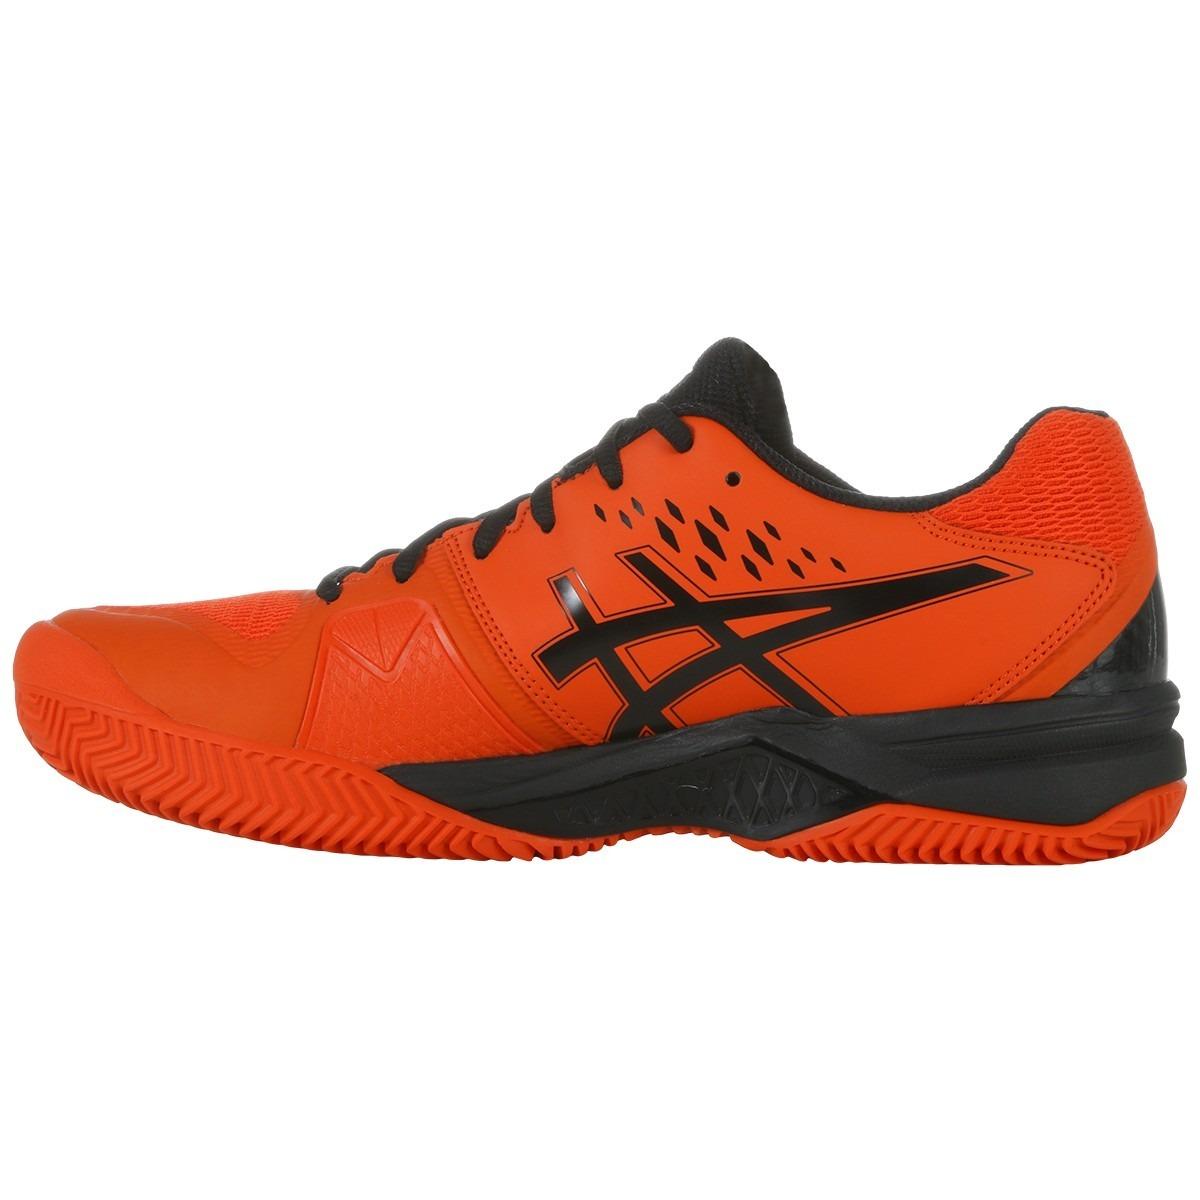 f4f77b7b10d zapatilla asics challenger 12 clay tenis-padel naranja-negro. Cargando zoom.